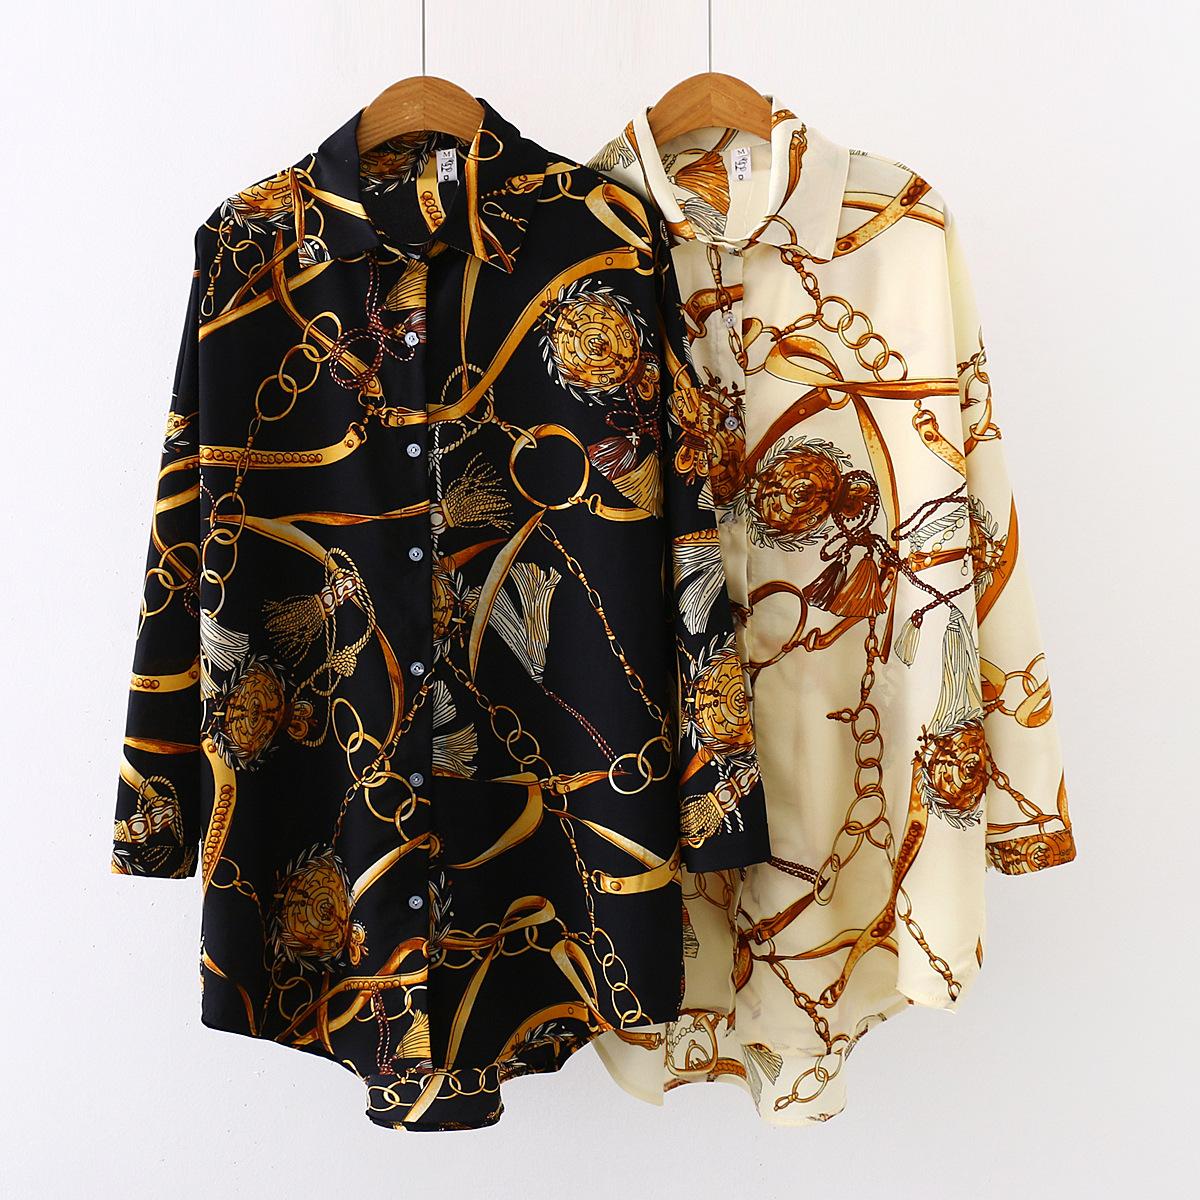 Plus Size Designer Shirts For Women 2021 S-5XL Print Blouses Chiffon Tops Spring Elegant Tunic